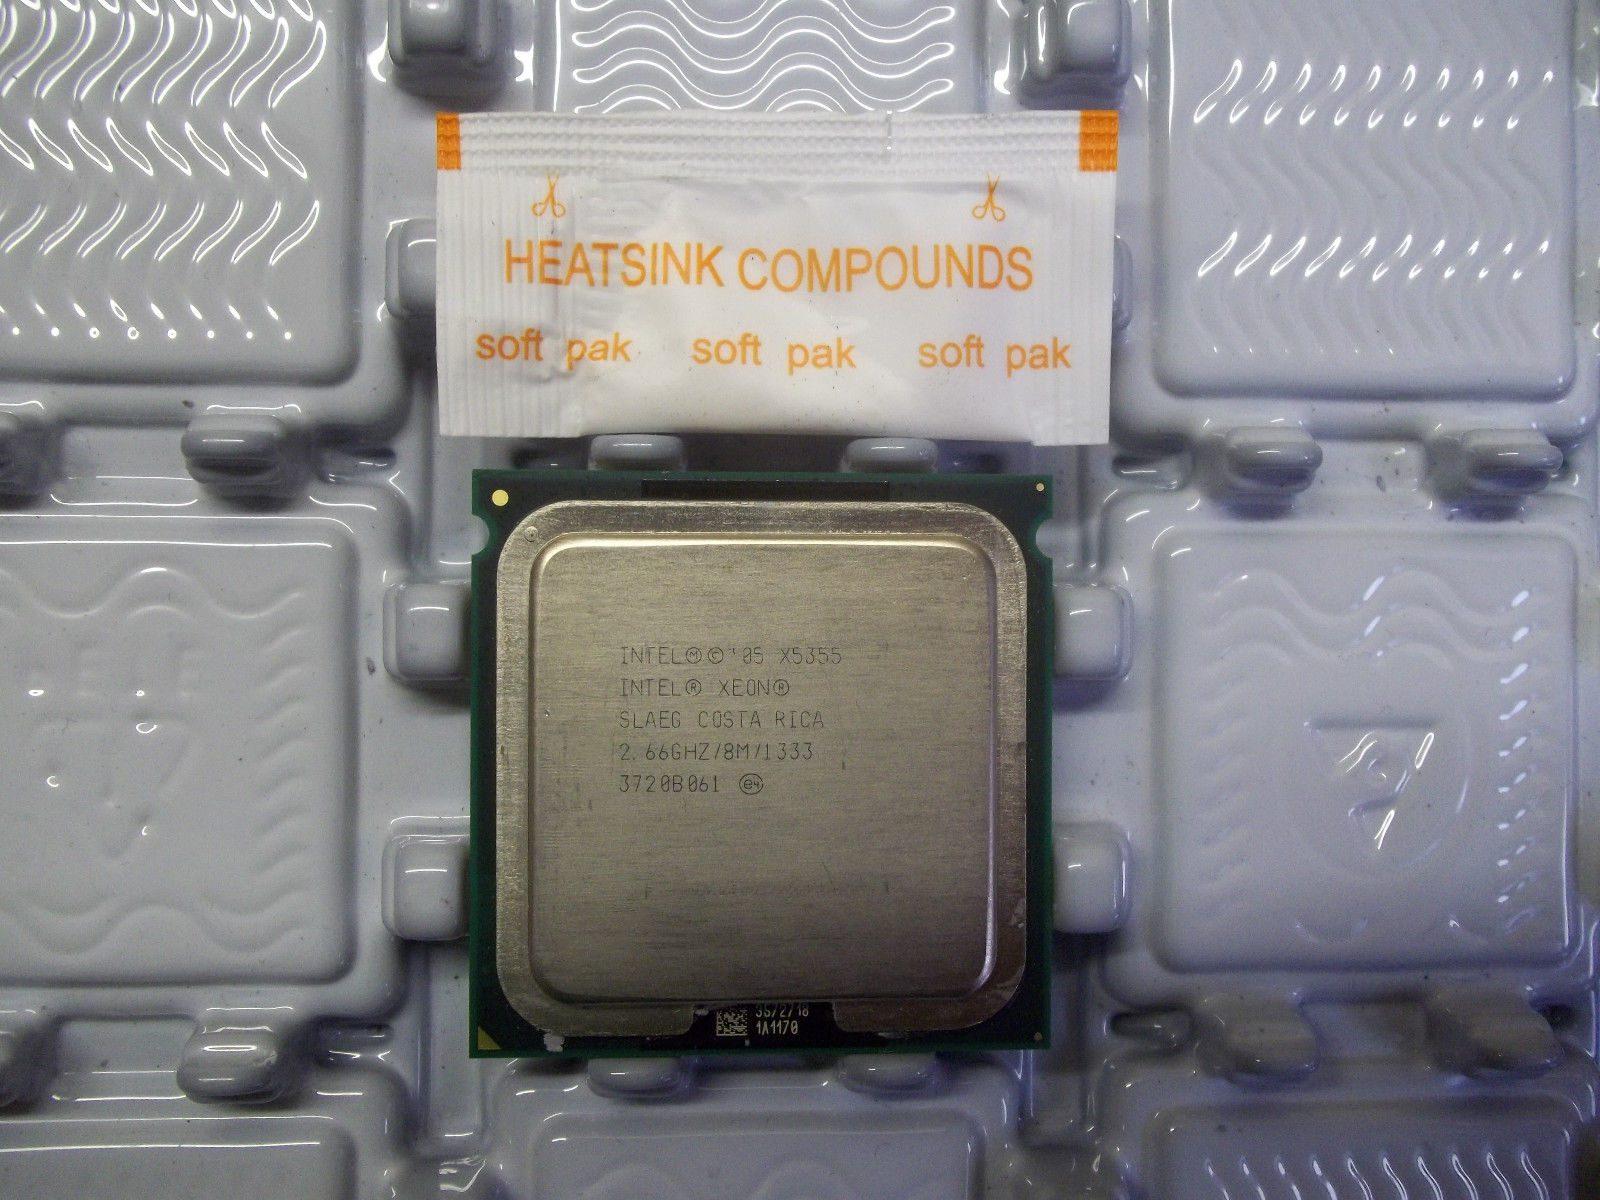 Matched Pair/_ Intel Xeon X5355 2.66GHz 8m 1333fsb Quad-Core LGA771 SLAEG